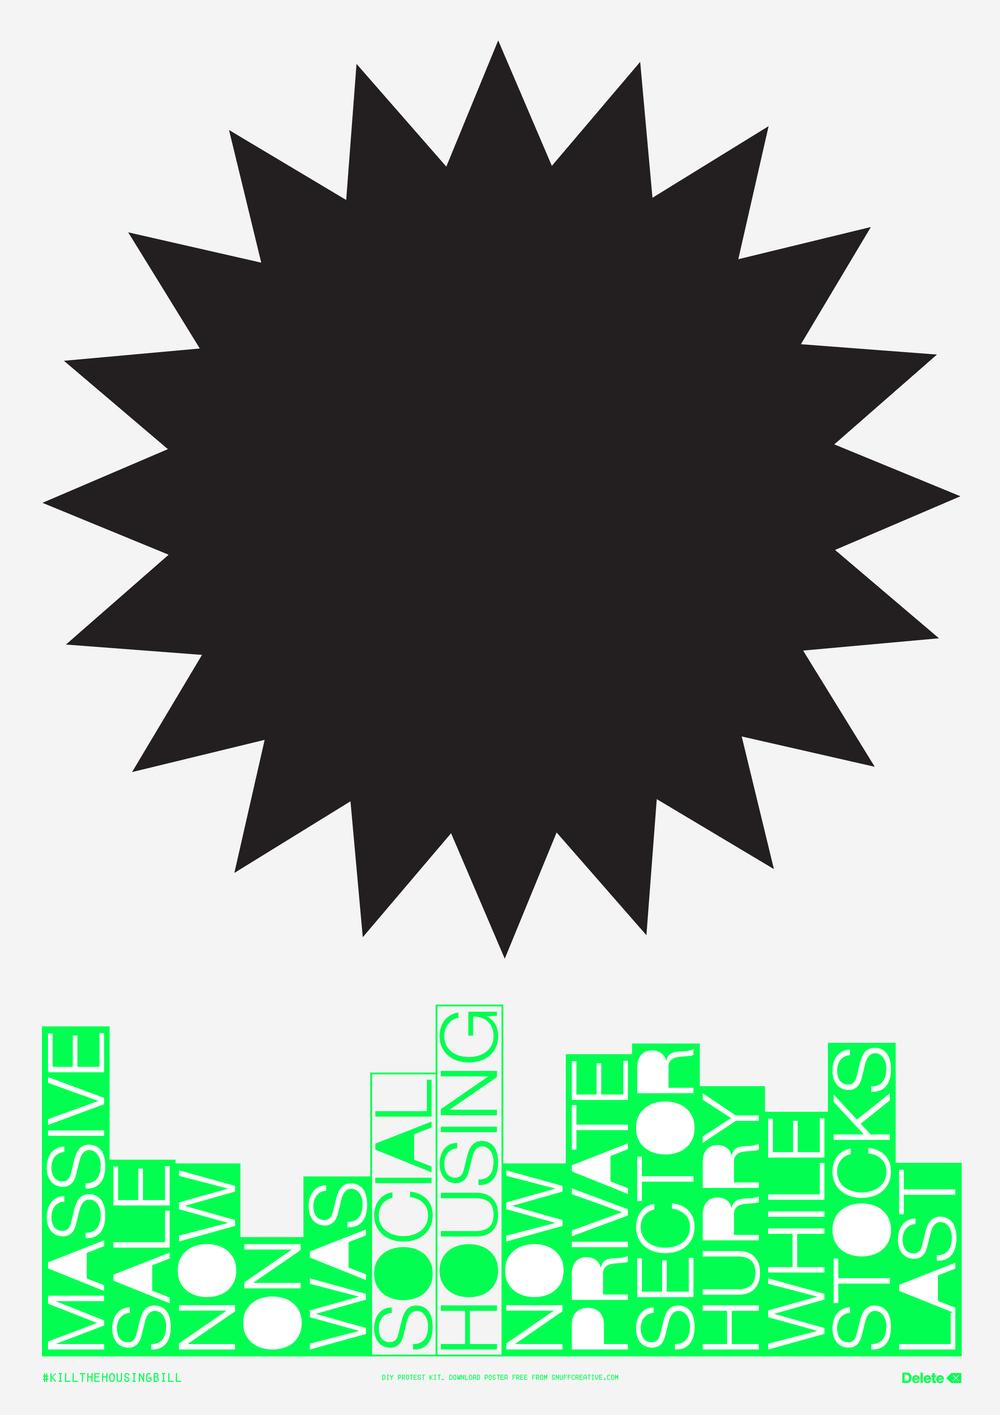 MASSIVE SALE TYPE POSTER_BLACK&GREY1-04.jpg